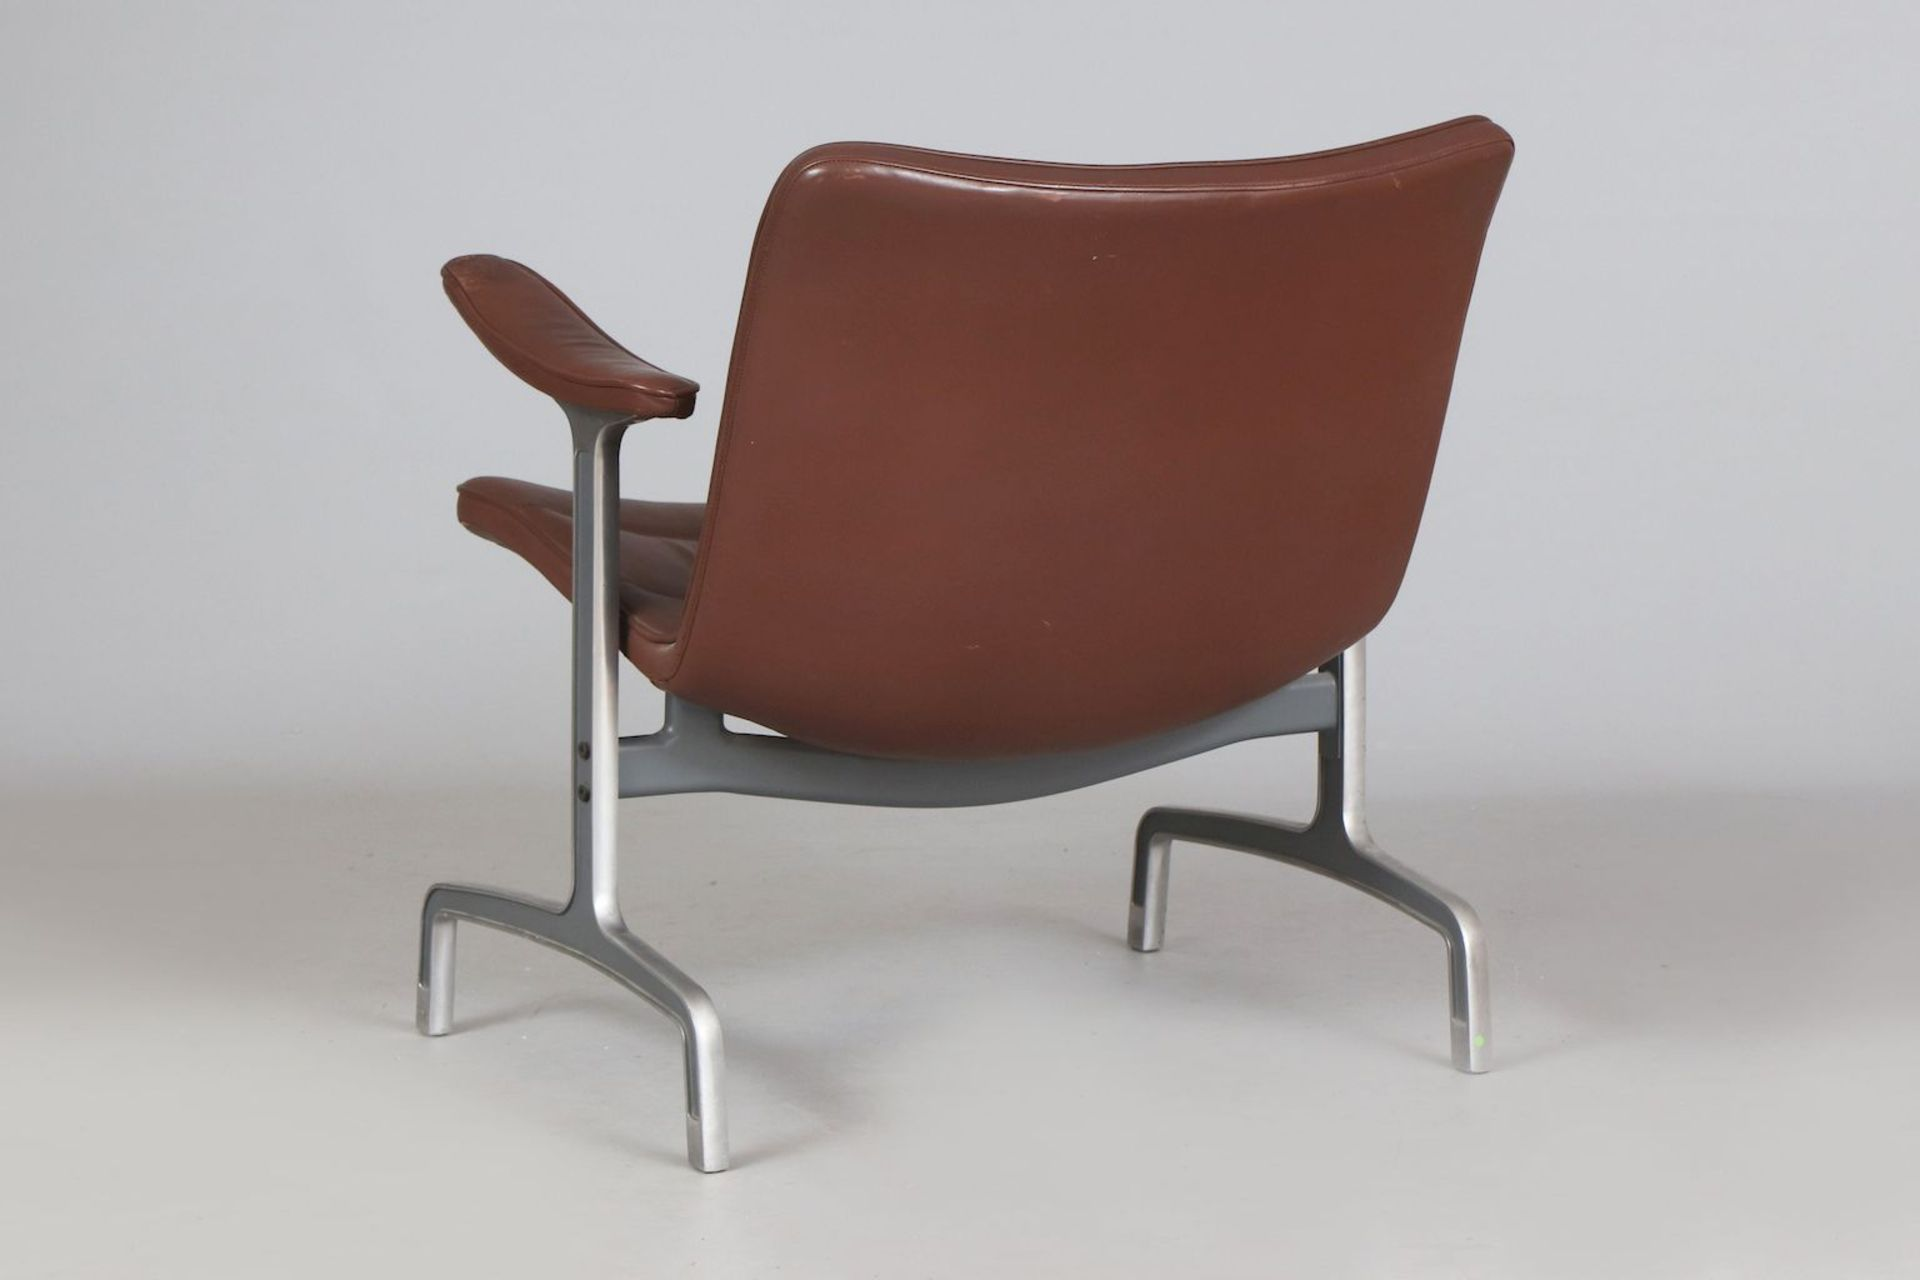 Besucher-Stuhl der 1970er Jahre - Image 3 of 3